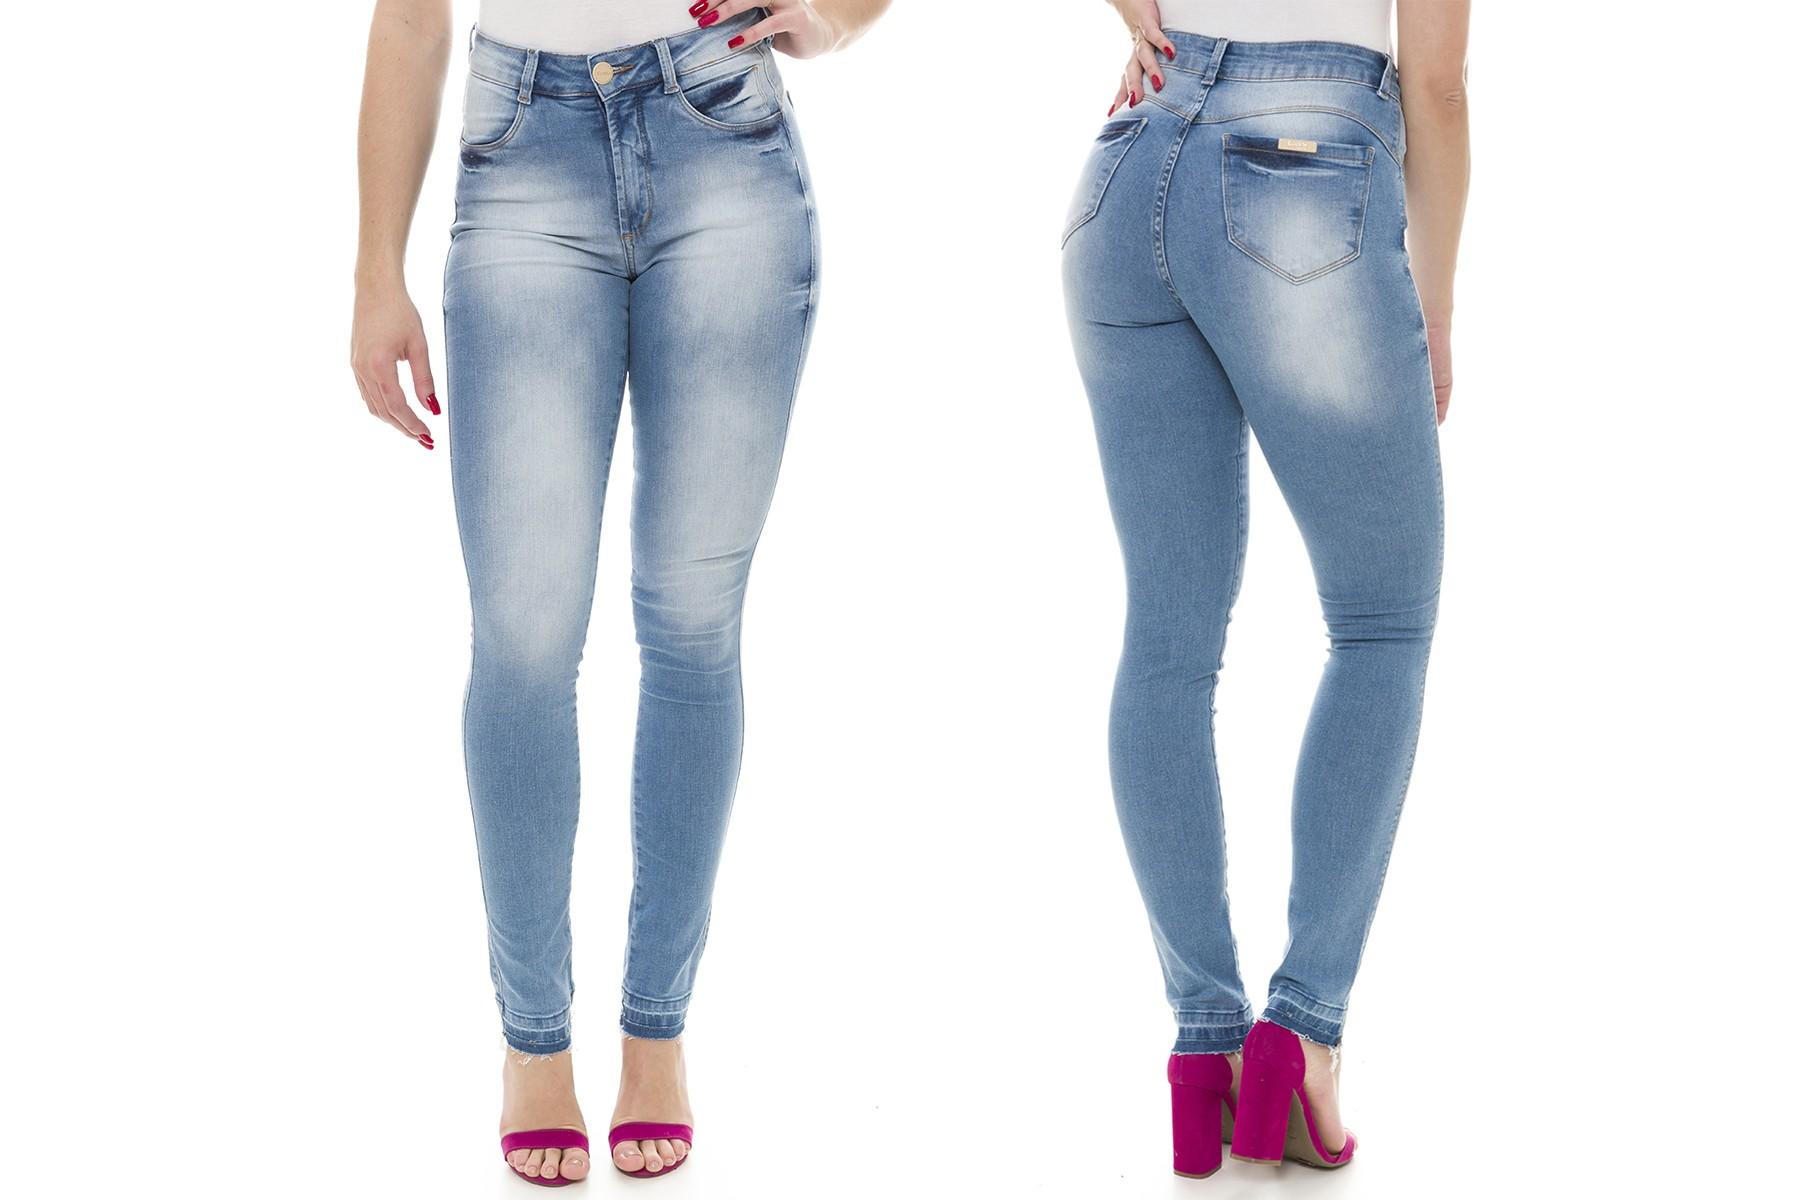 211914 Cala Jeans Skinny (montagem)